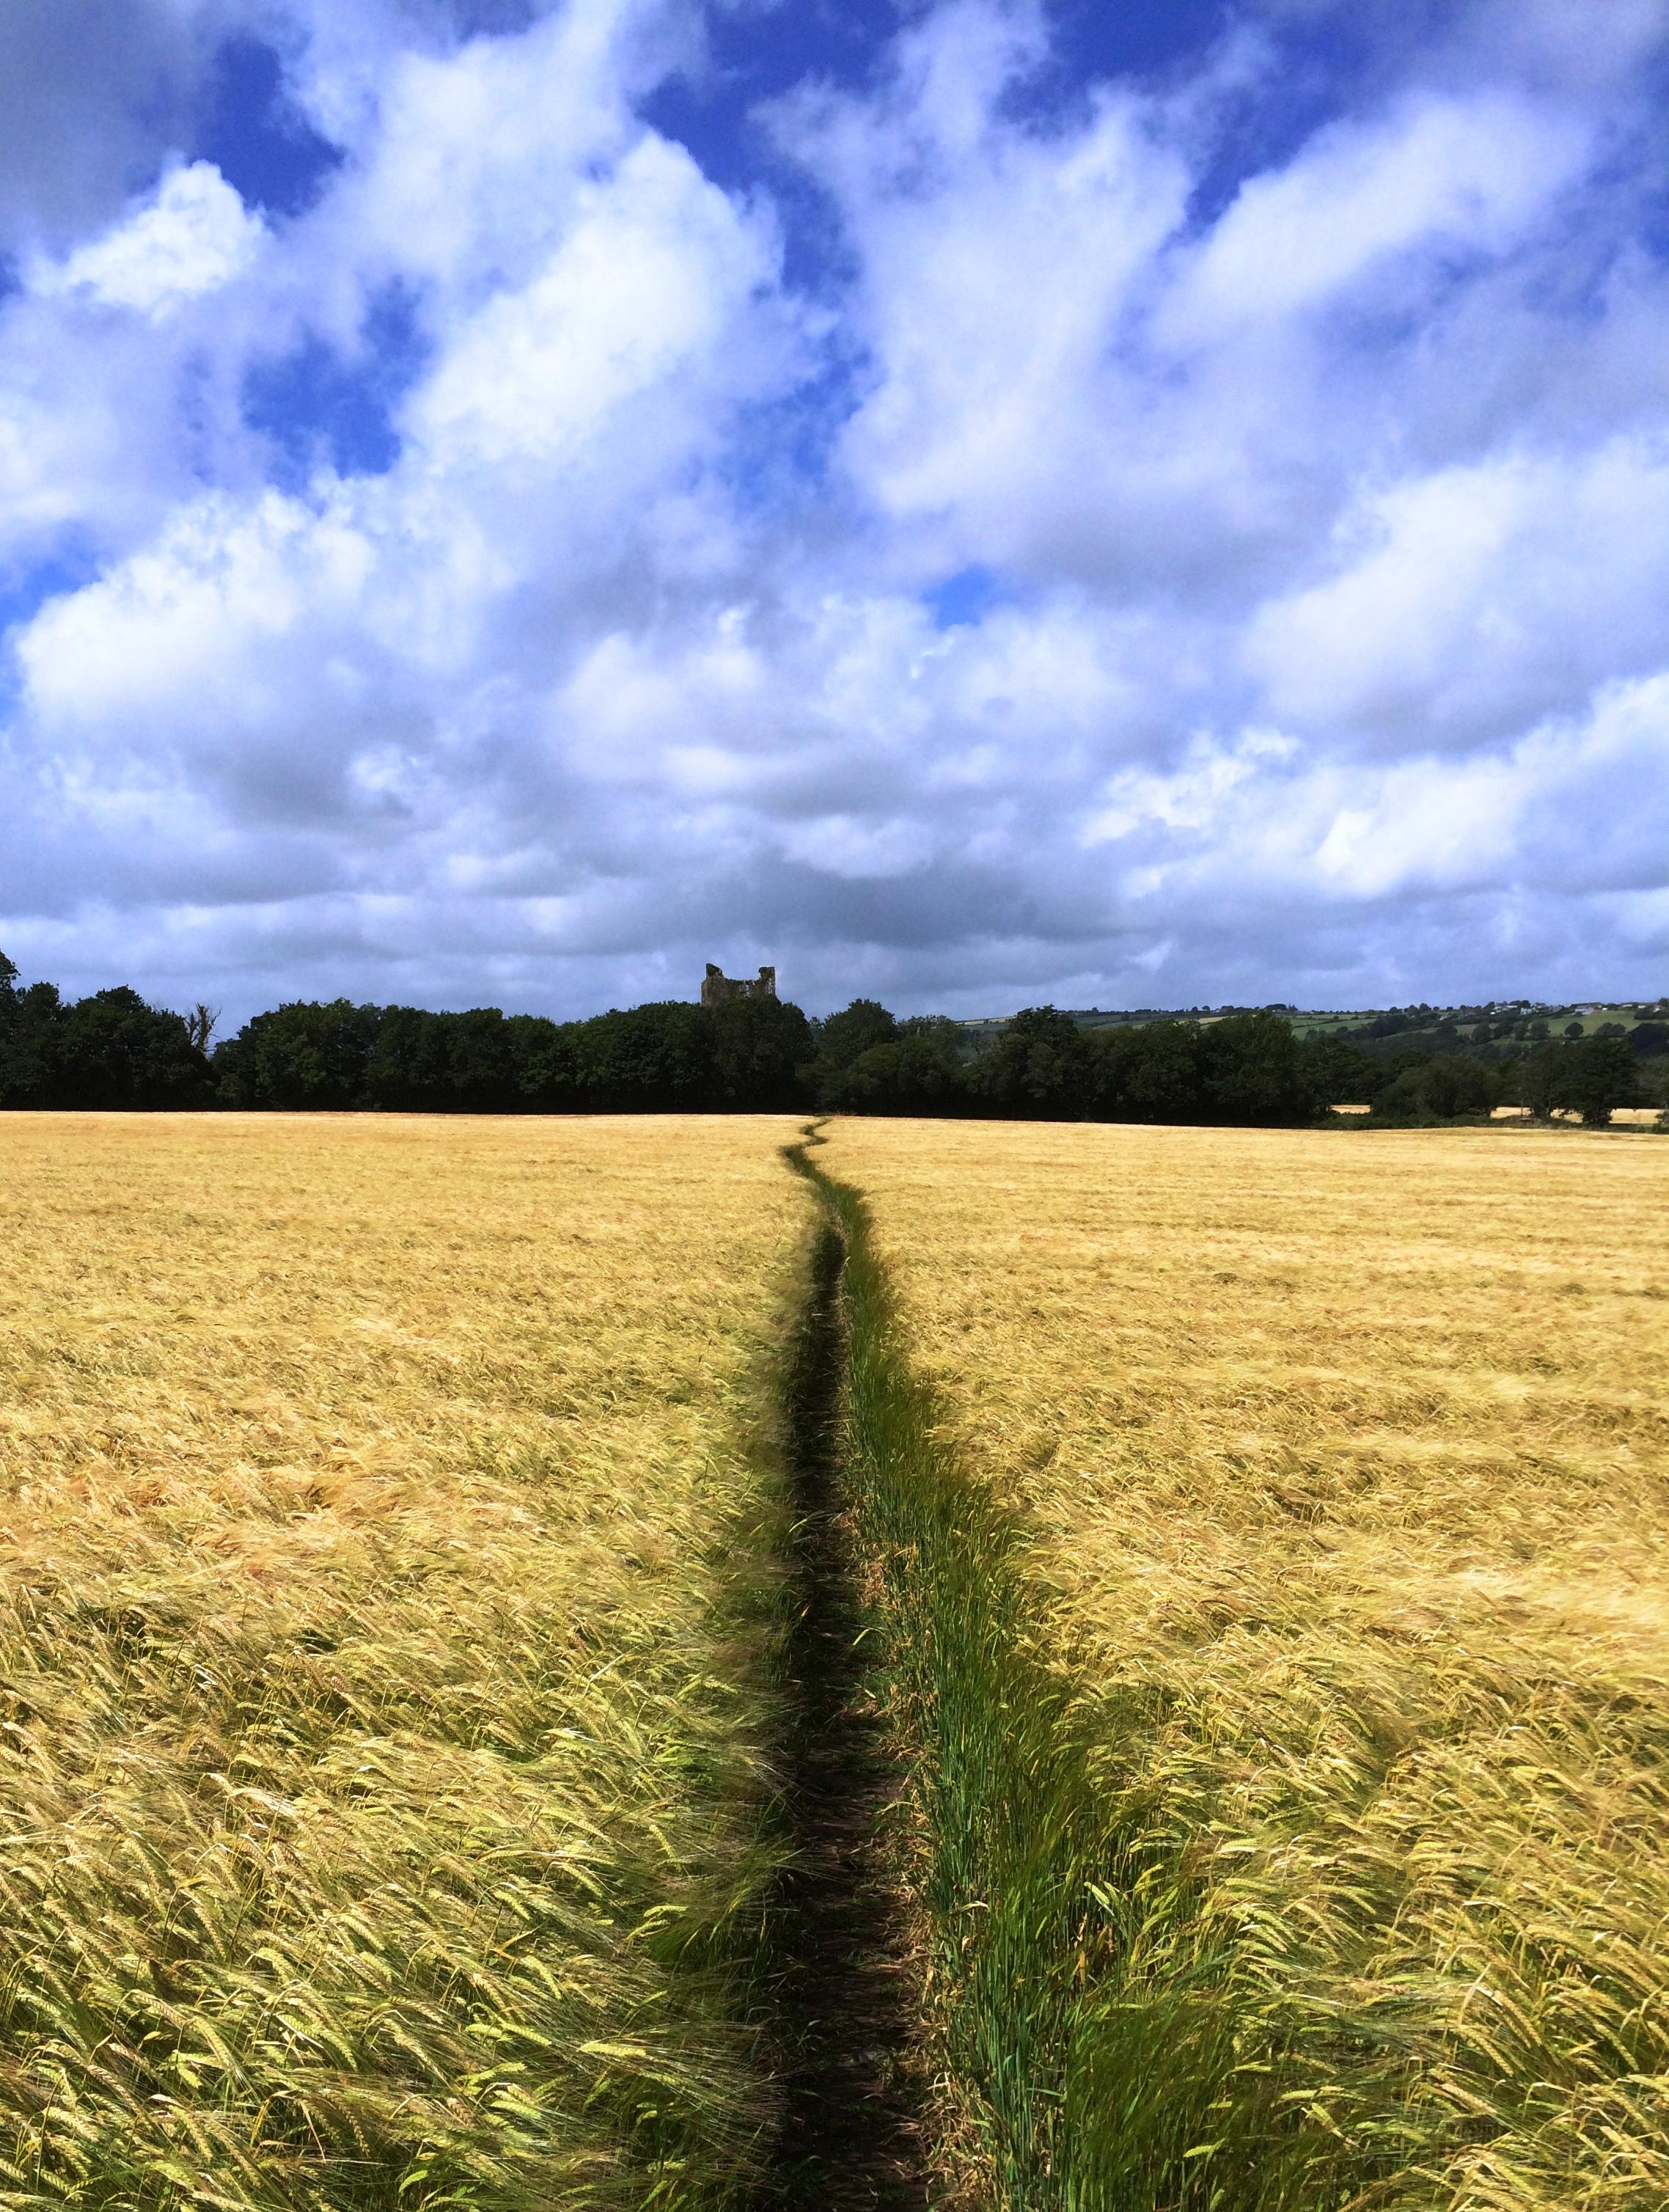 ... : Worn Path essays; Title: Free Essays on Eudora Welty's A Worn Path